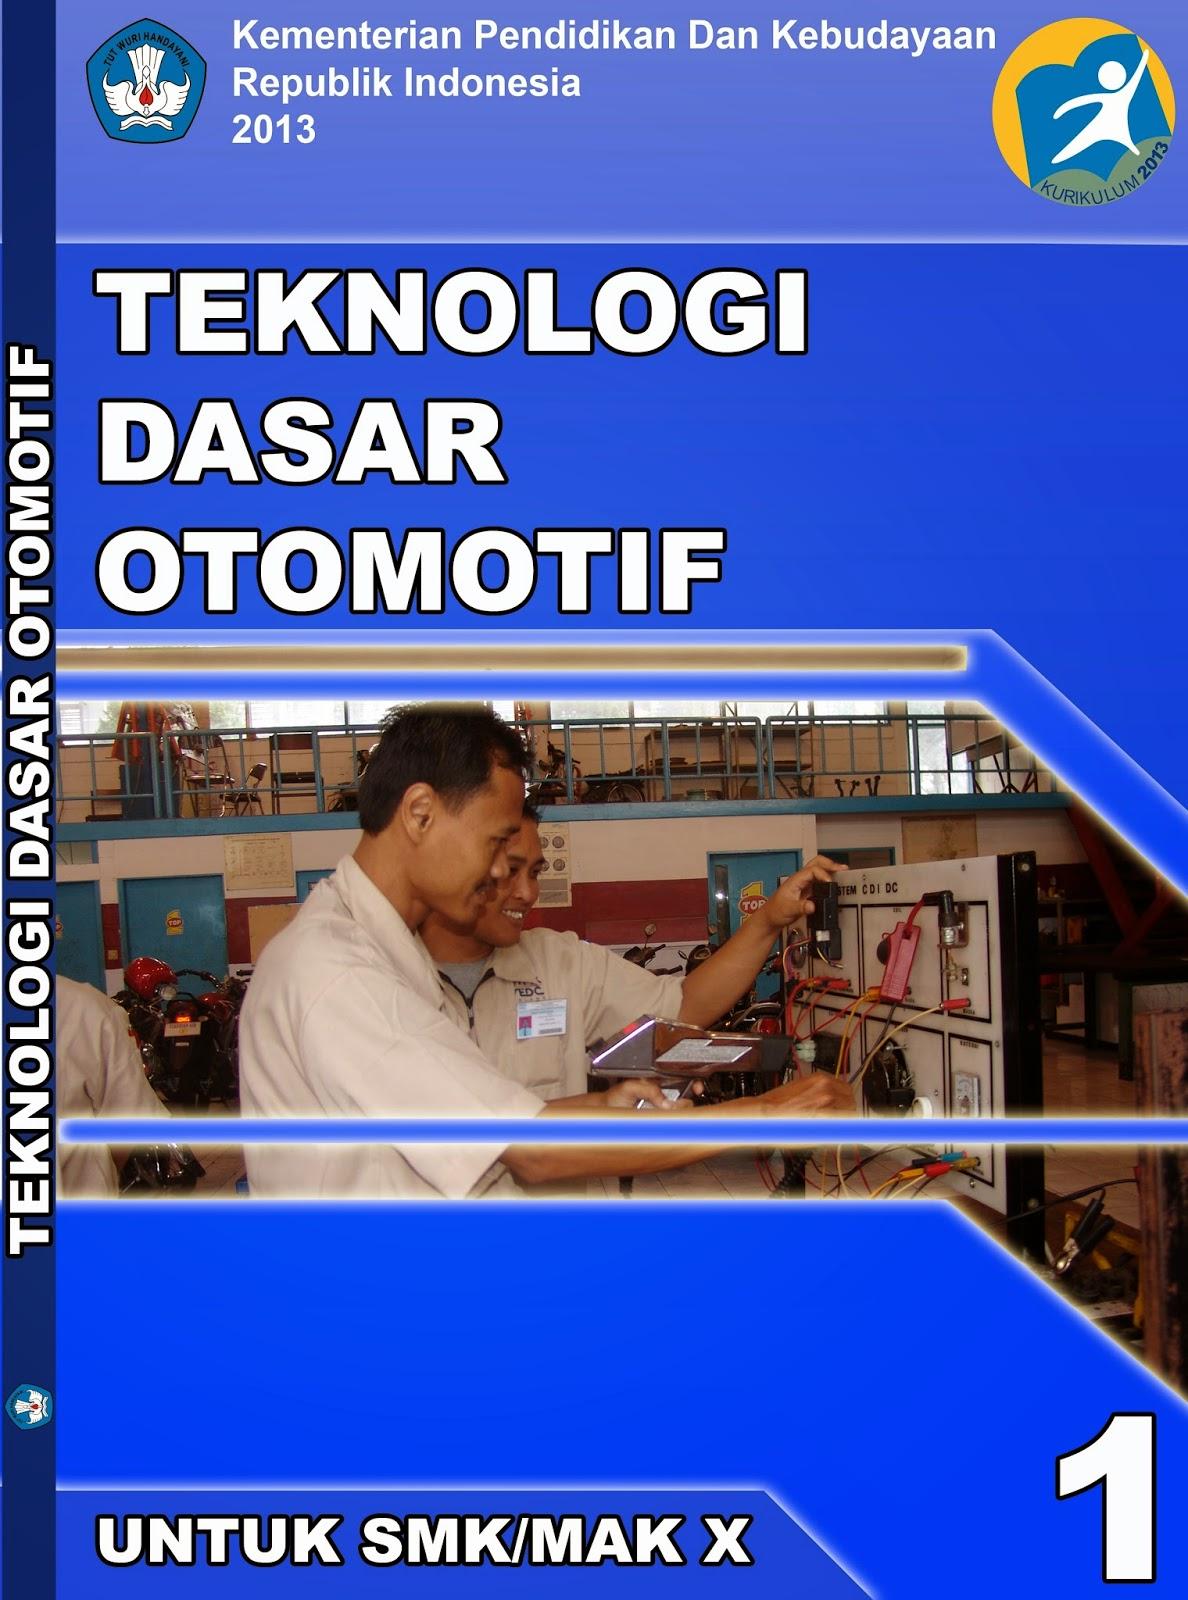 TEKNOLOGI DASAR OTOMOTIF | TKR X SMK PGRI 1 MEJAYAN